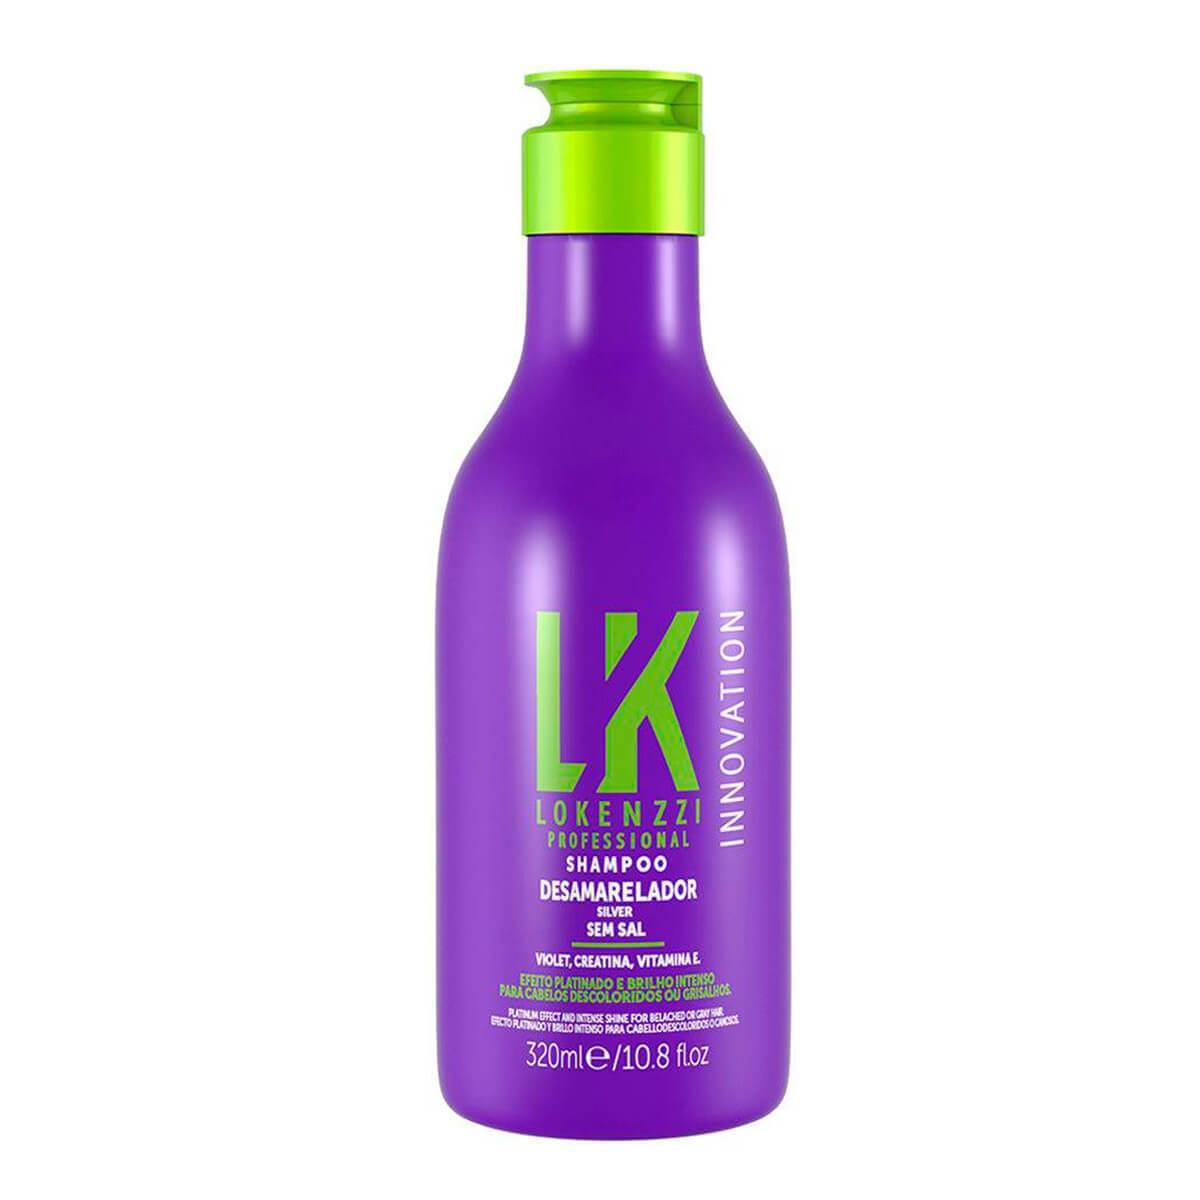 Shampoo Lokenzzi Desamarelador 320ml